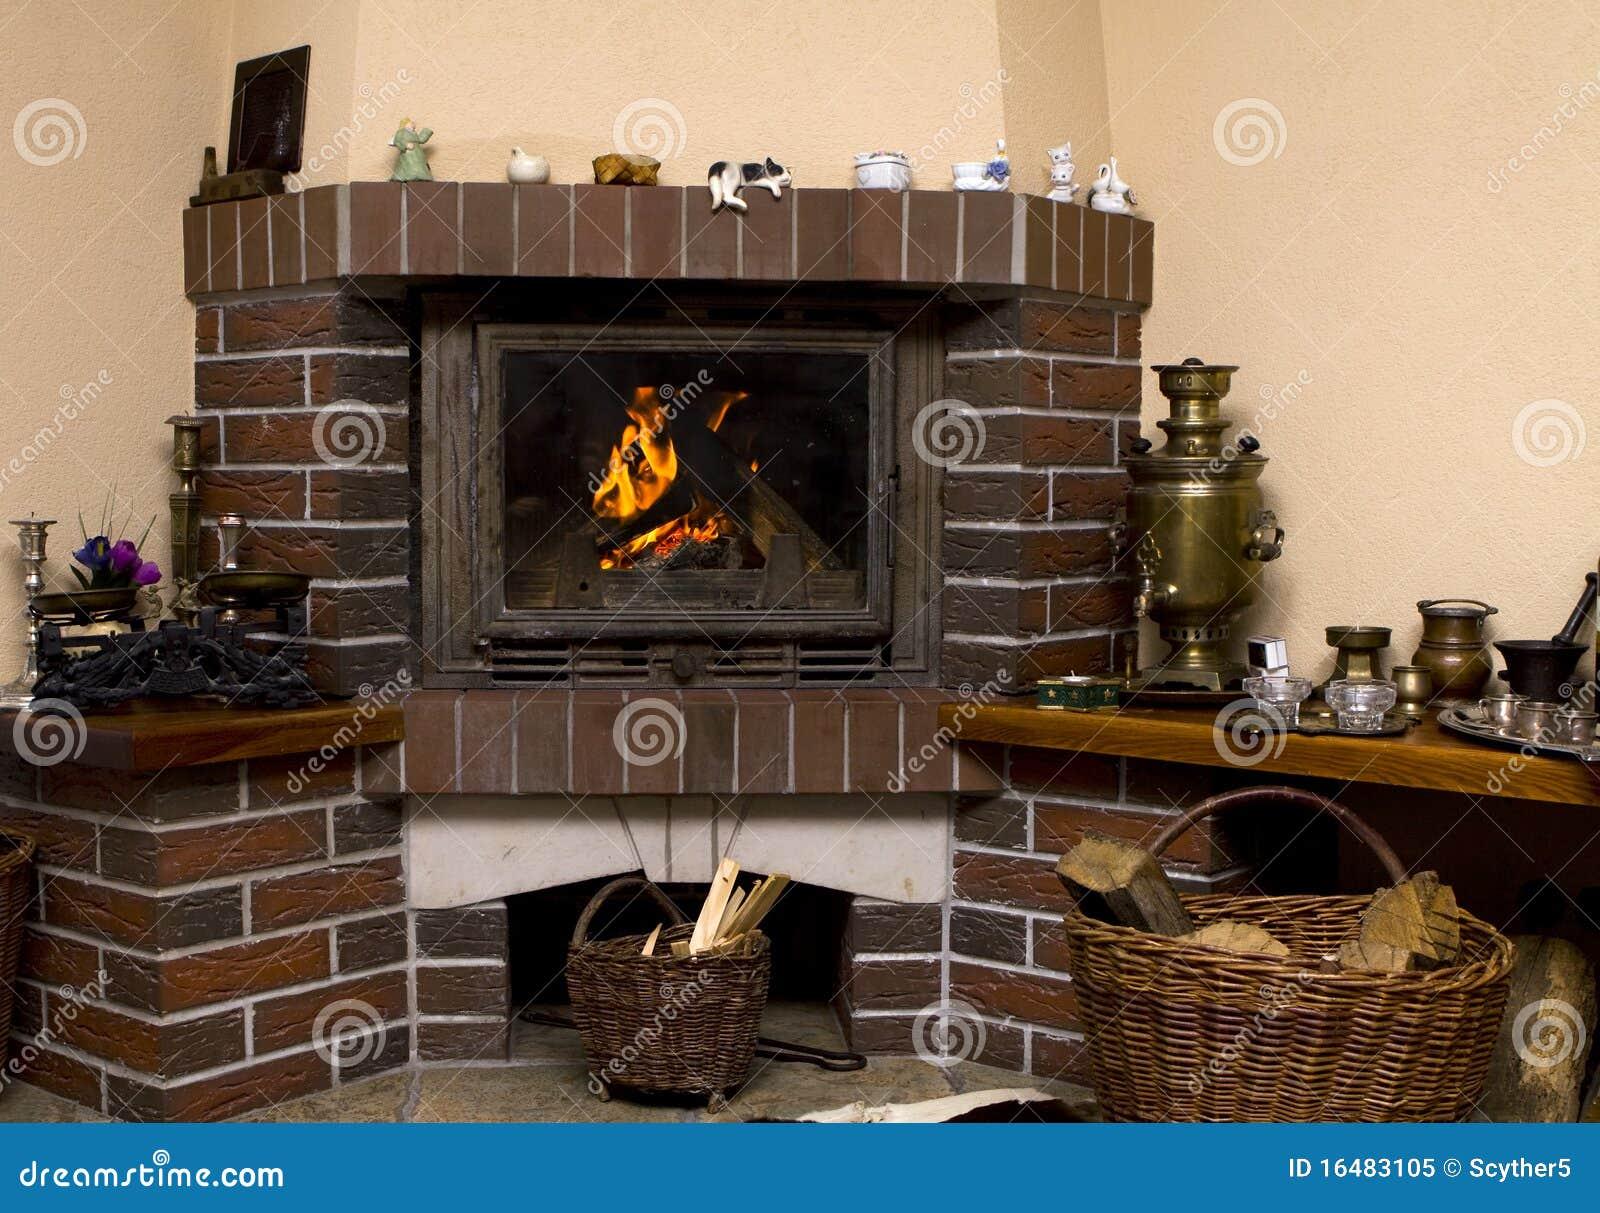 Log cabin on a lake royalty free stock photography image 7866317 - Log Cabin Fireplace Royalty Free Stock Photo Image 16483105